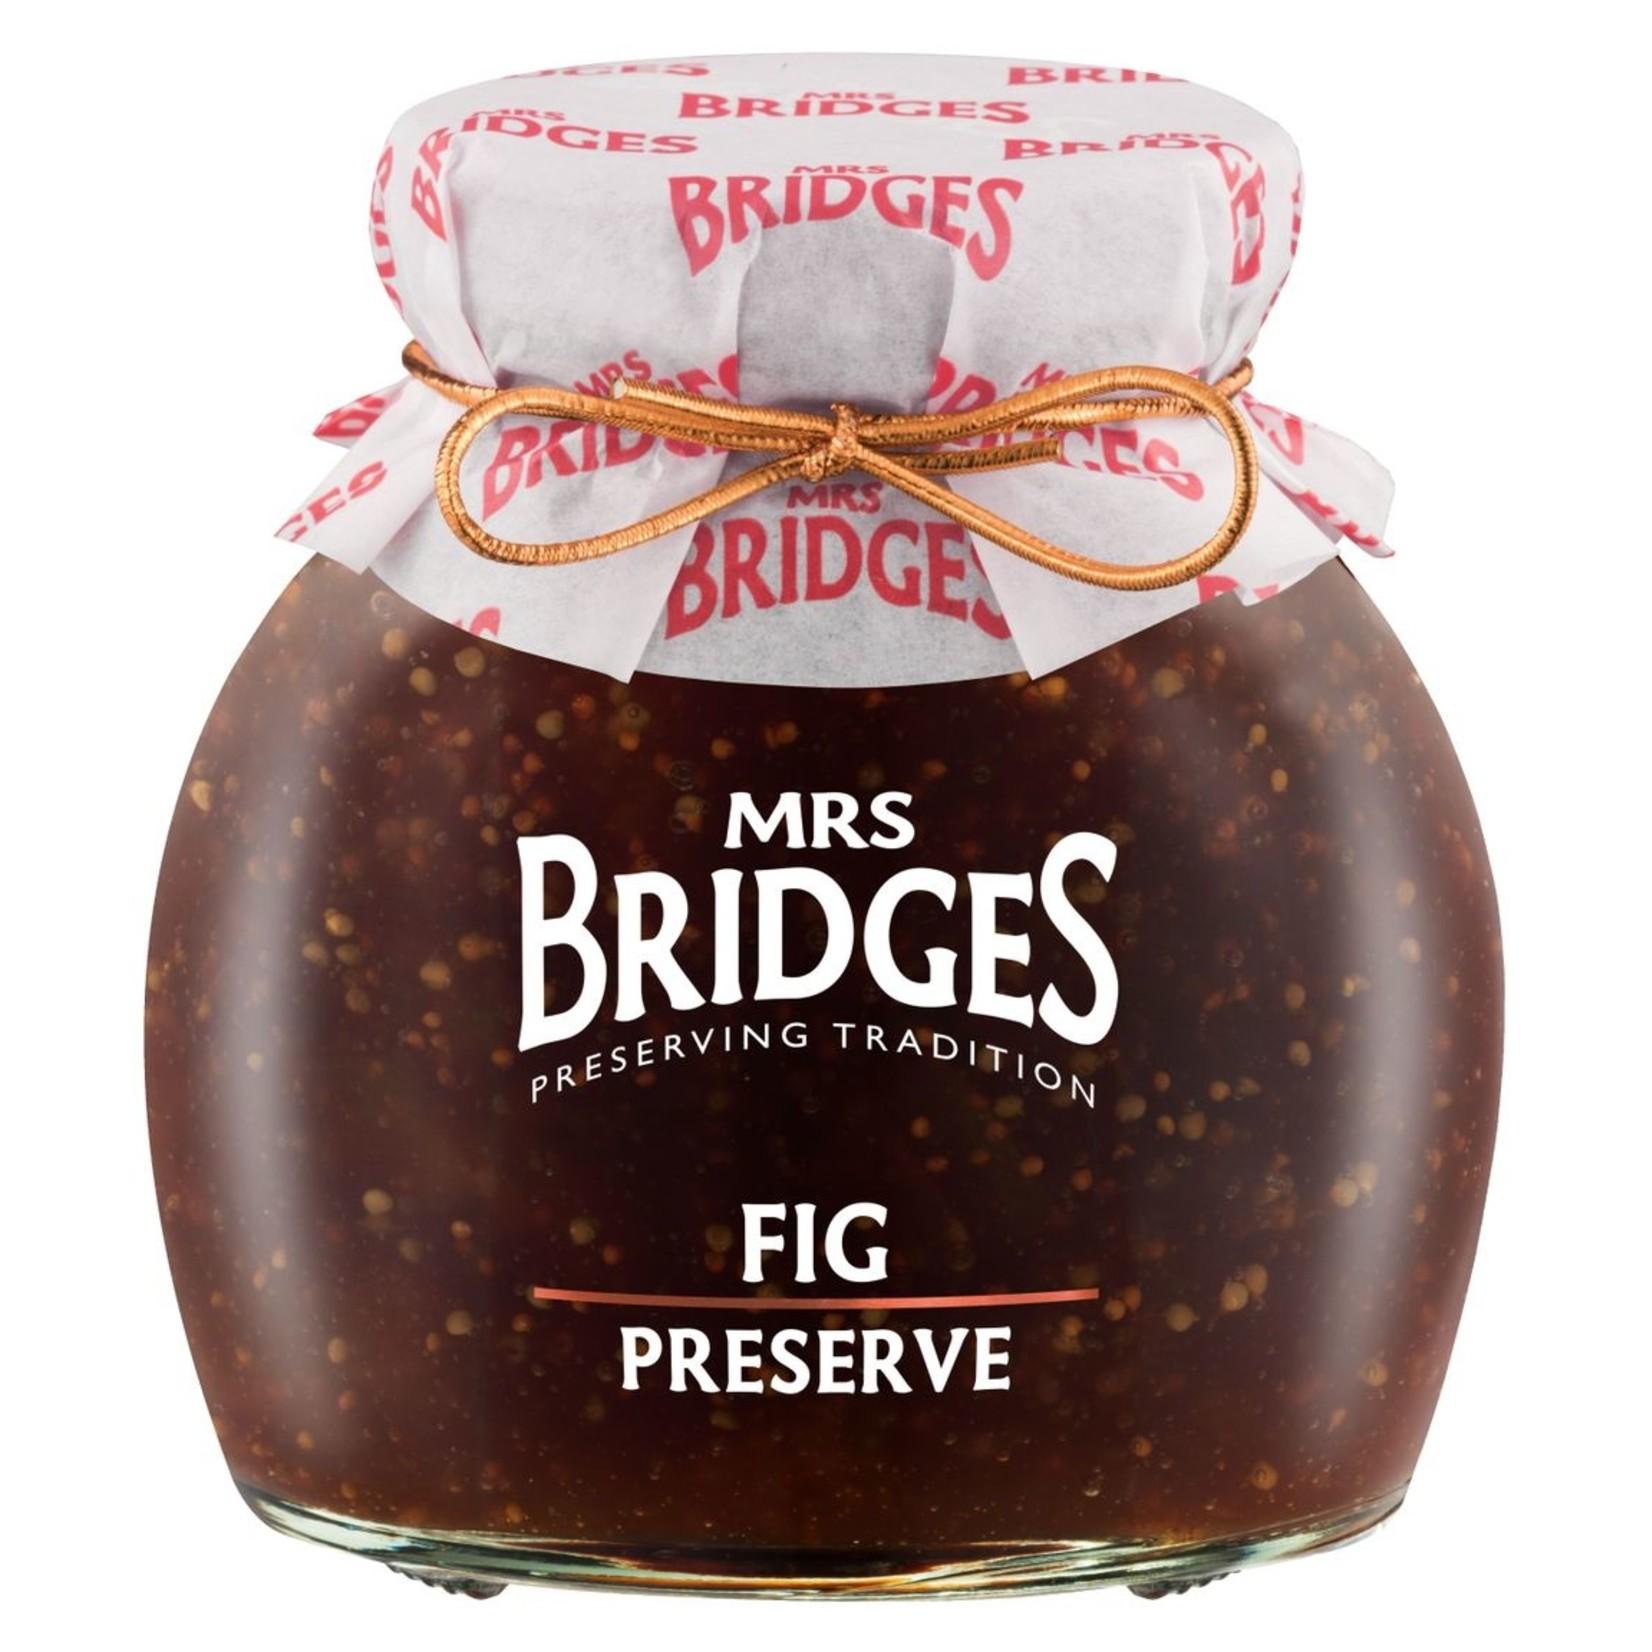 Mrs. Bridges Fig Preserve